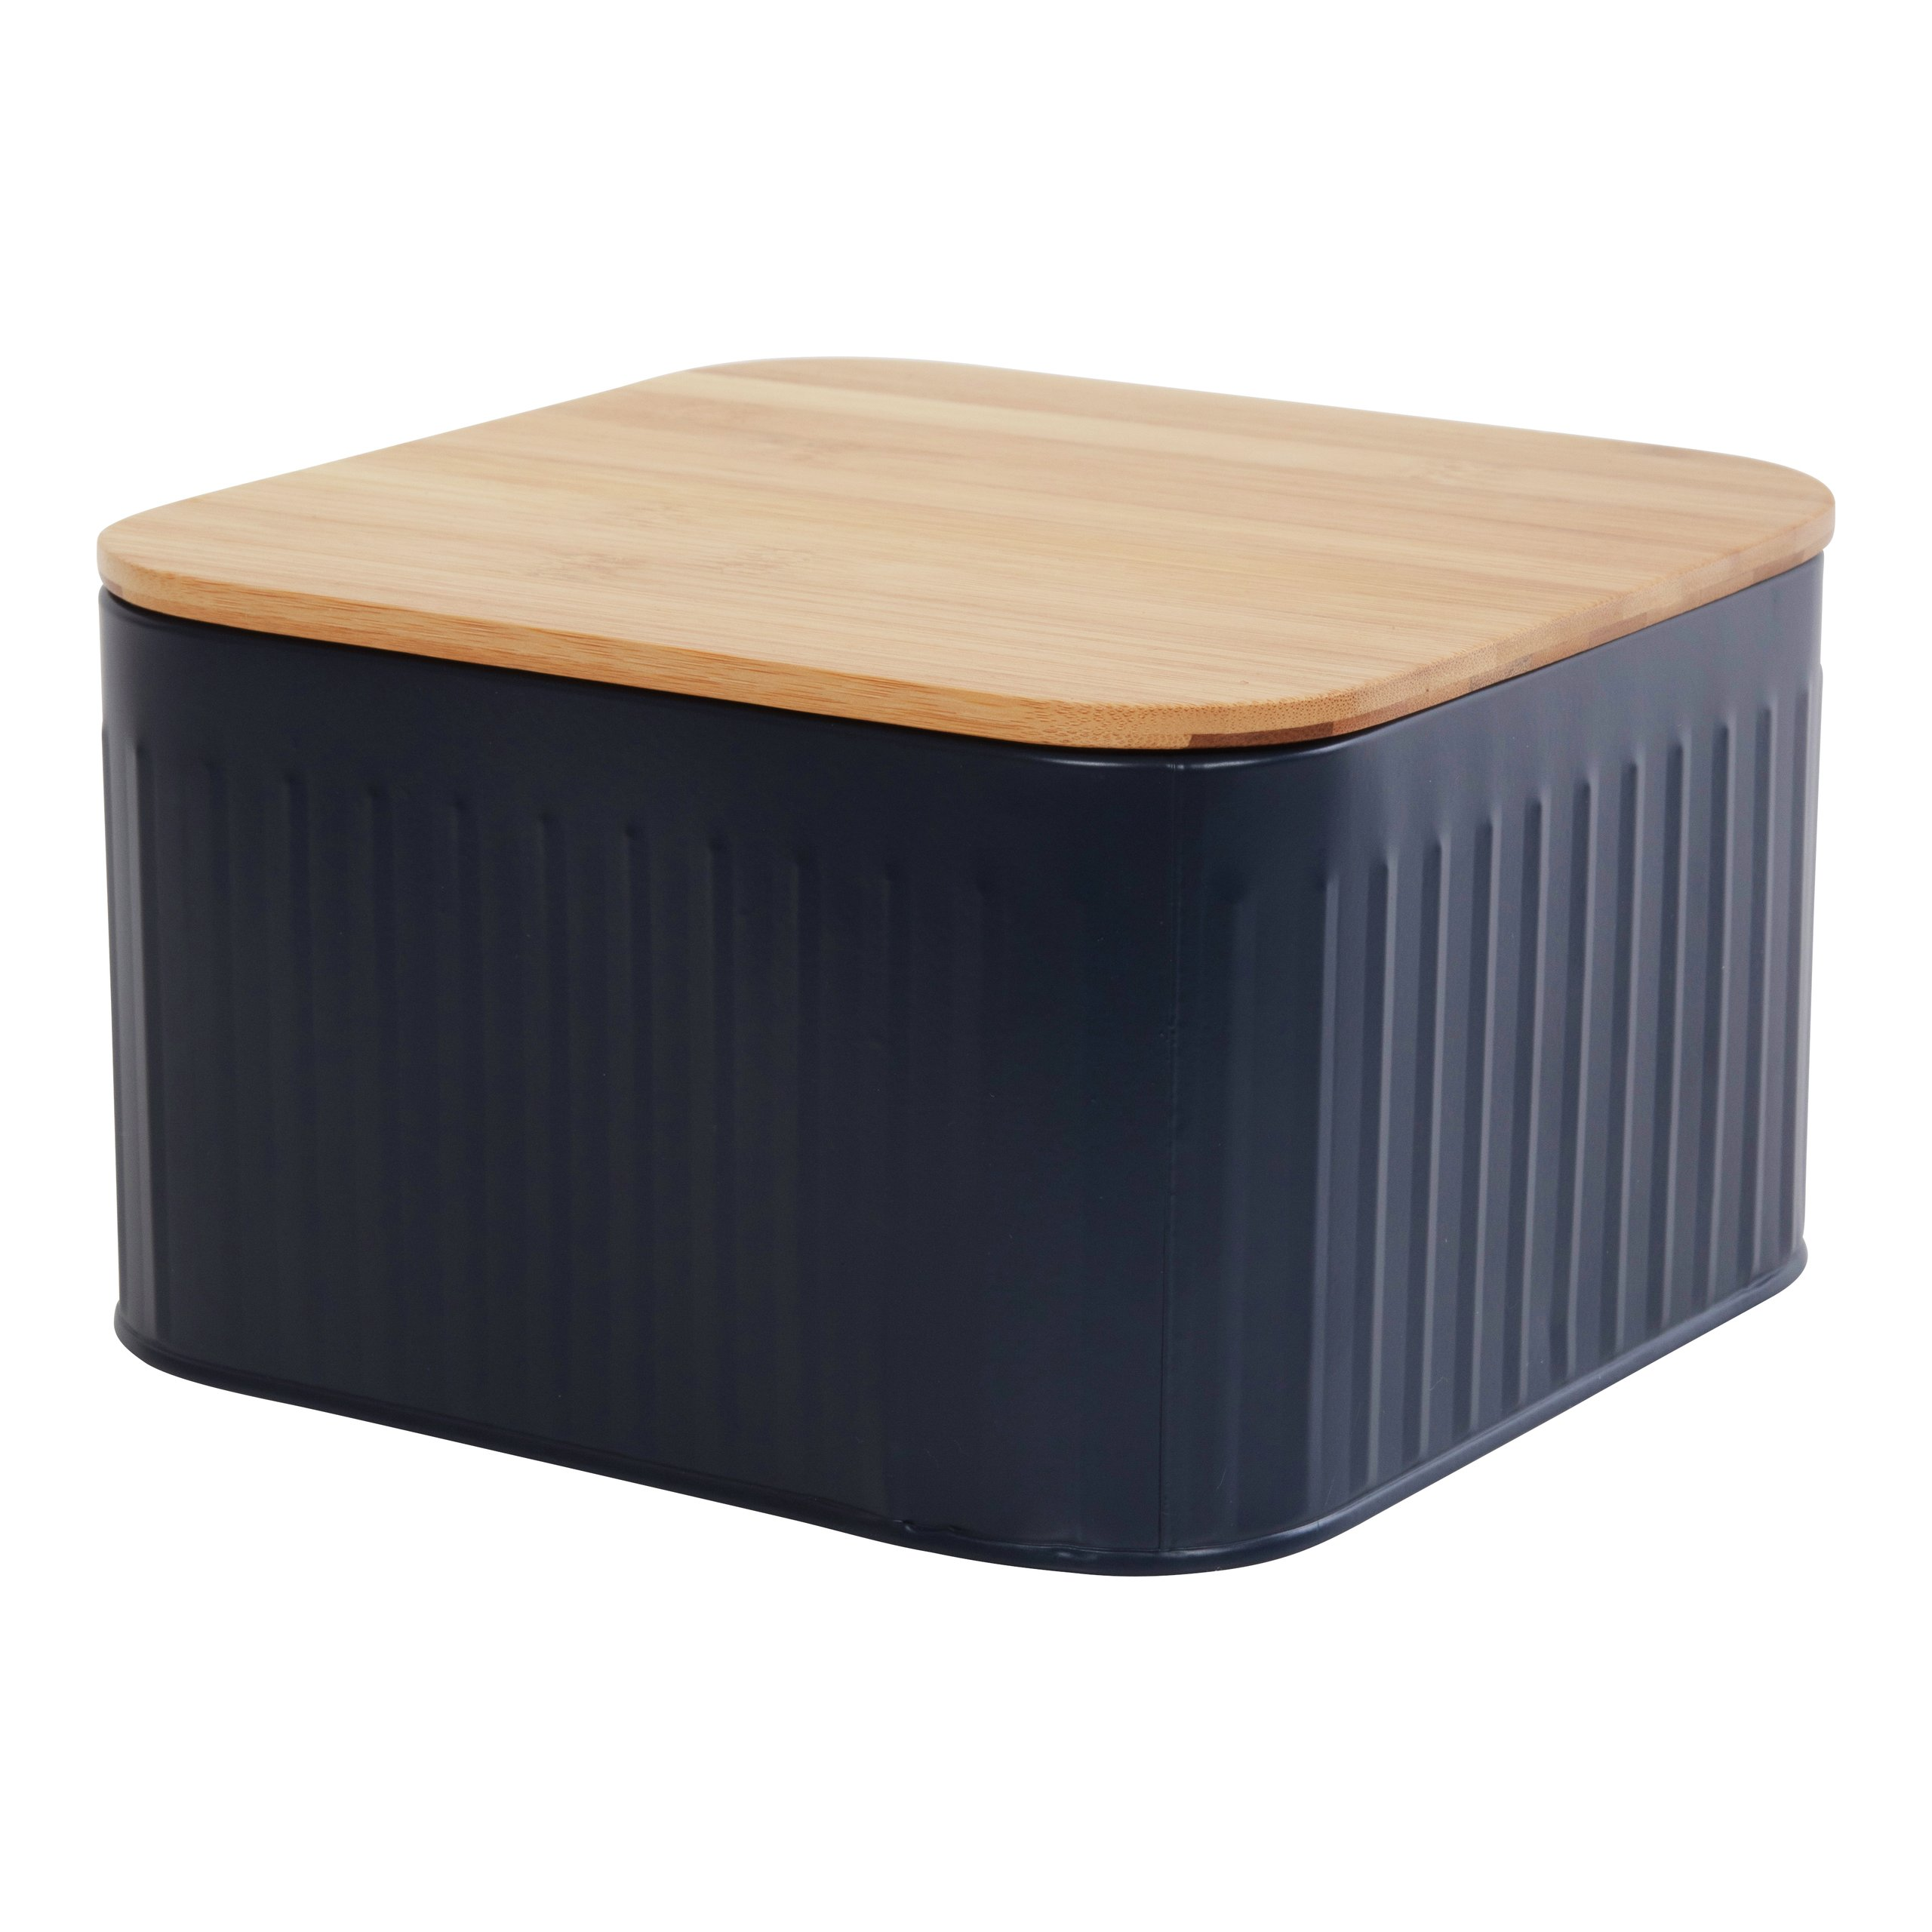 BLUE KNEKKEBRØDBOKS 11X20CM-BOX5001